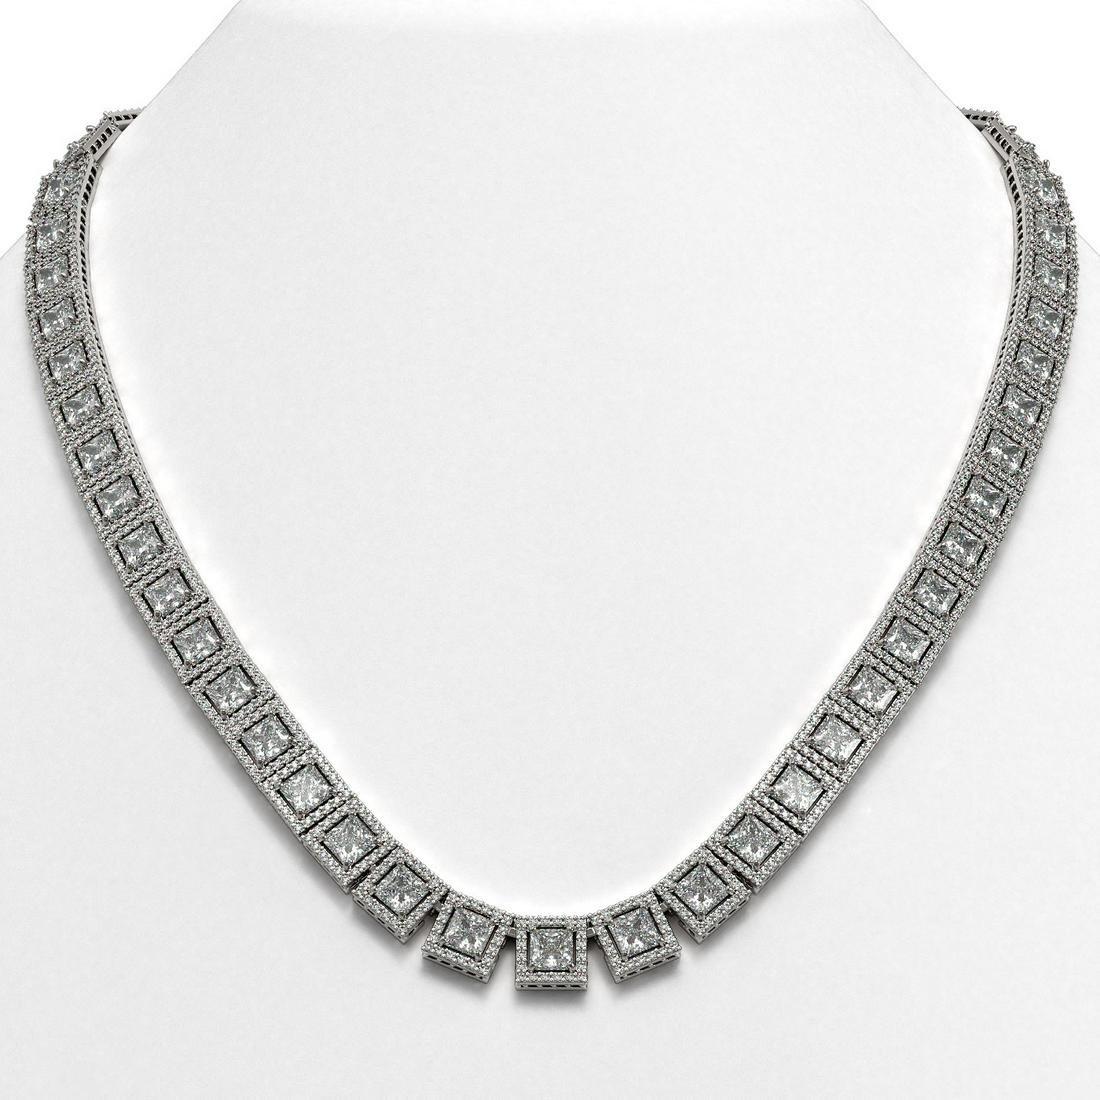 41.80 ctw Princess Cut Diamond Micro Pave Necklace 18K